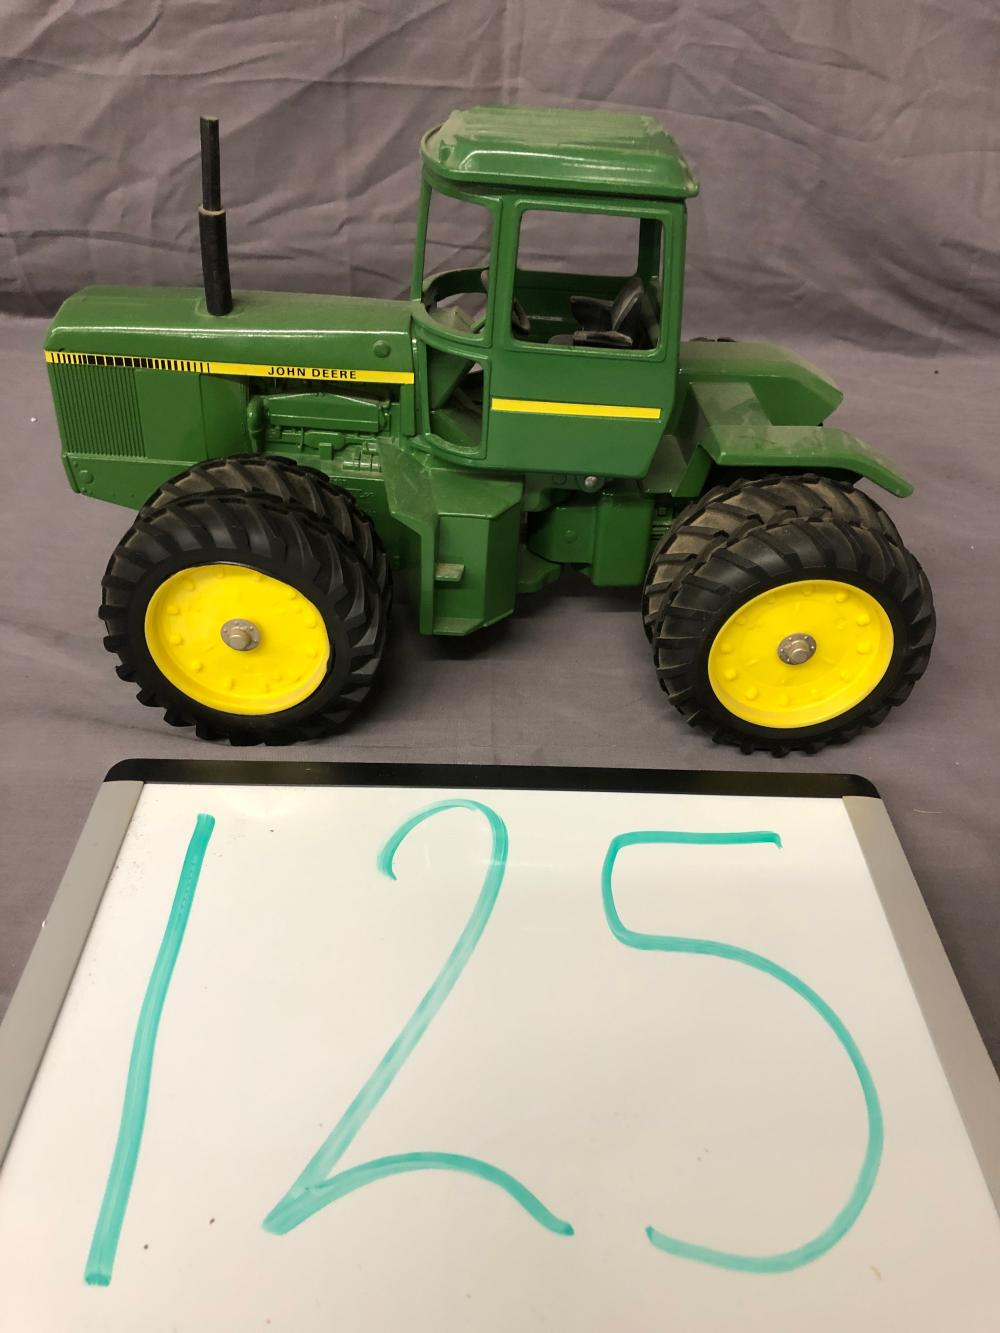 1/16th Scale John Deere 4-Wheel Tractor